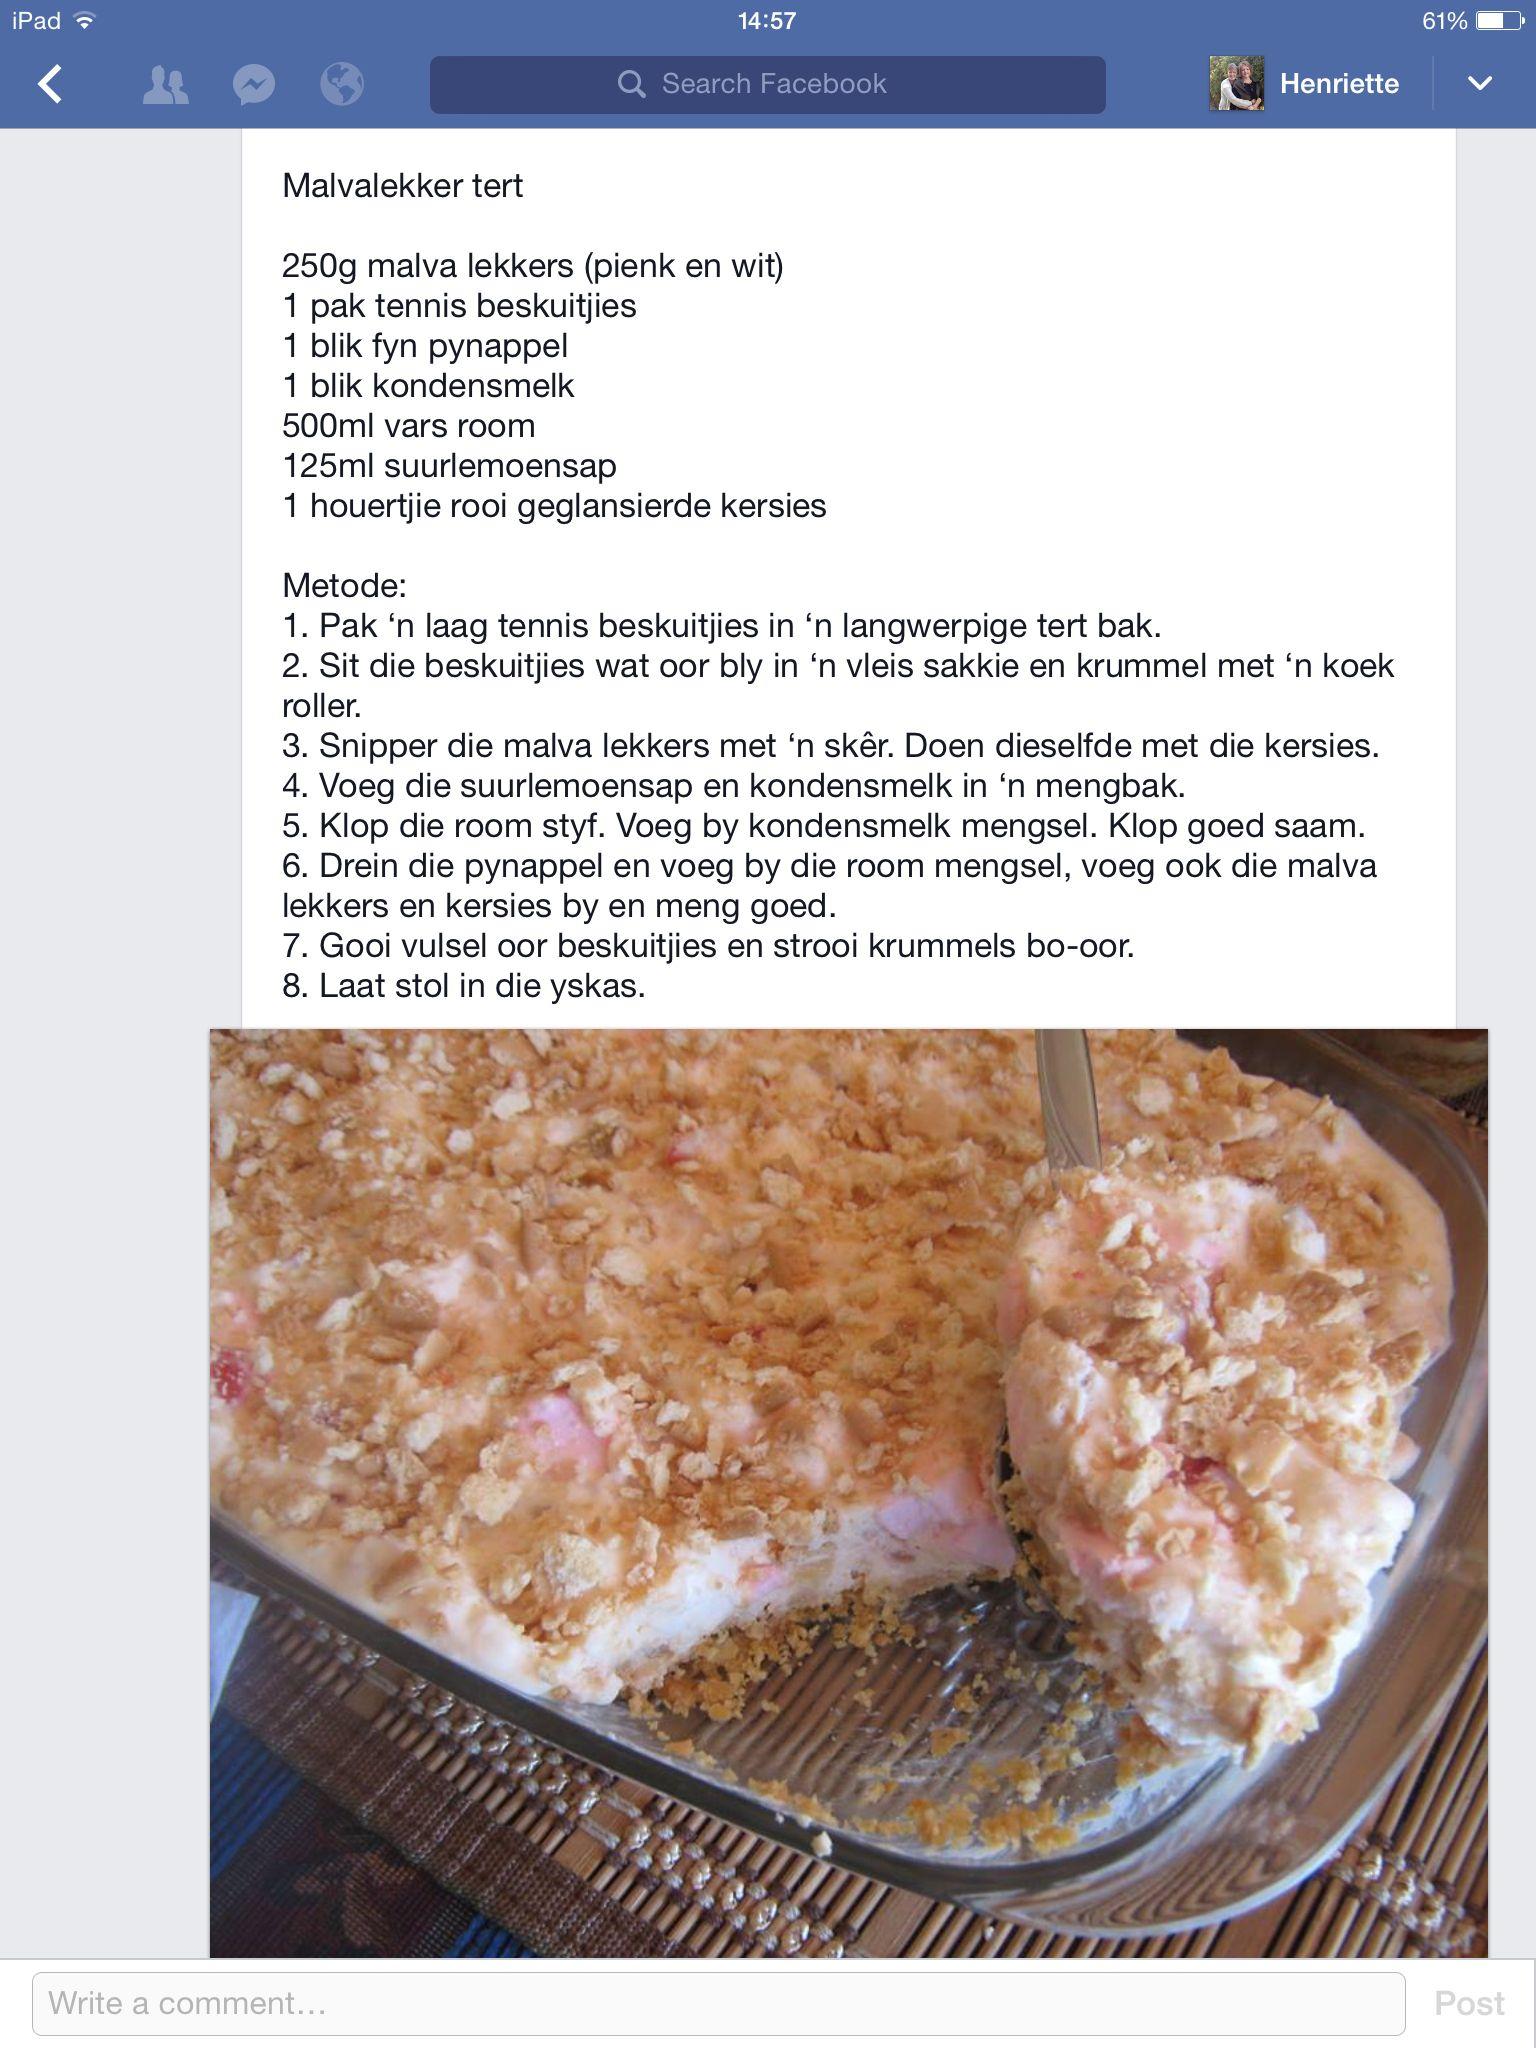 Malva lekker tert desserts yummy pinterest malva lekker tert forumfinder Images